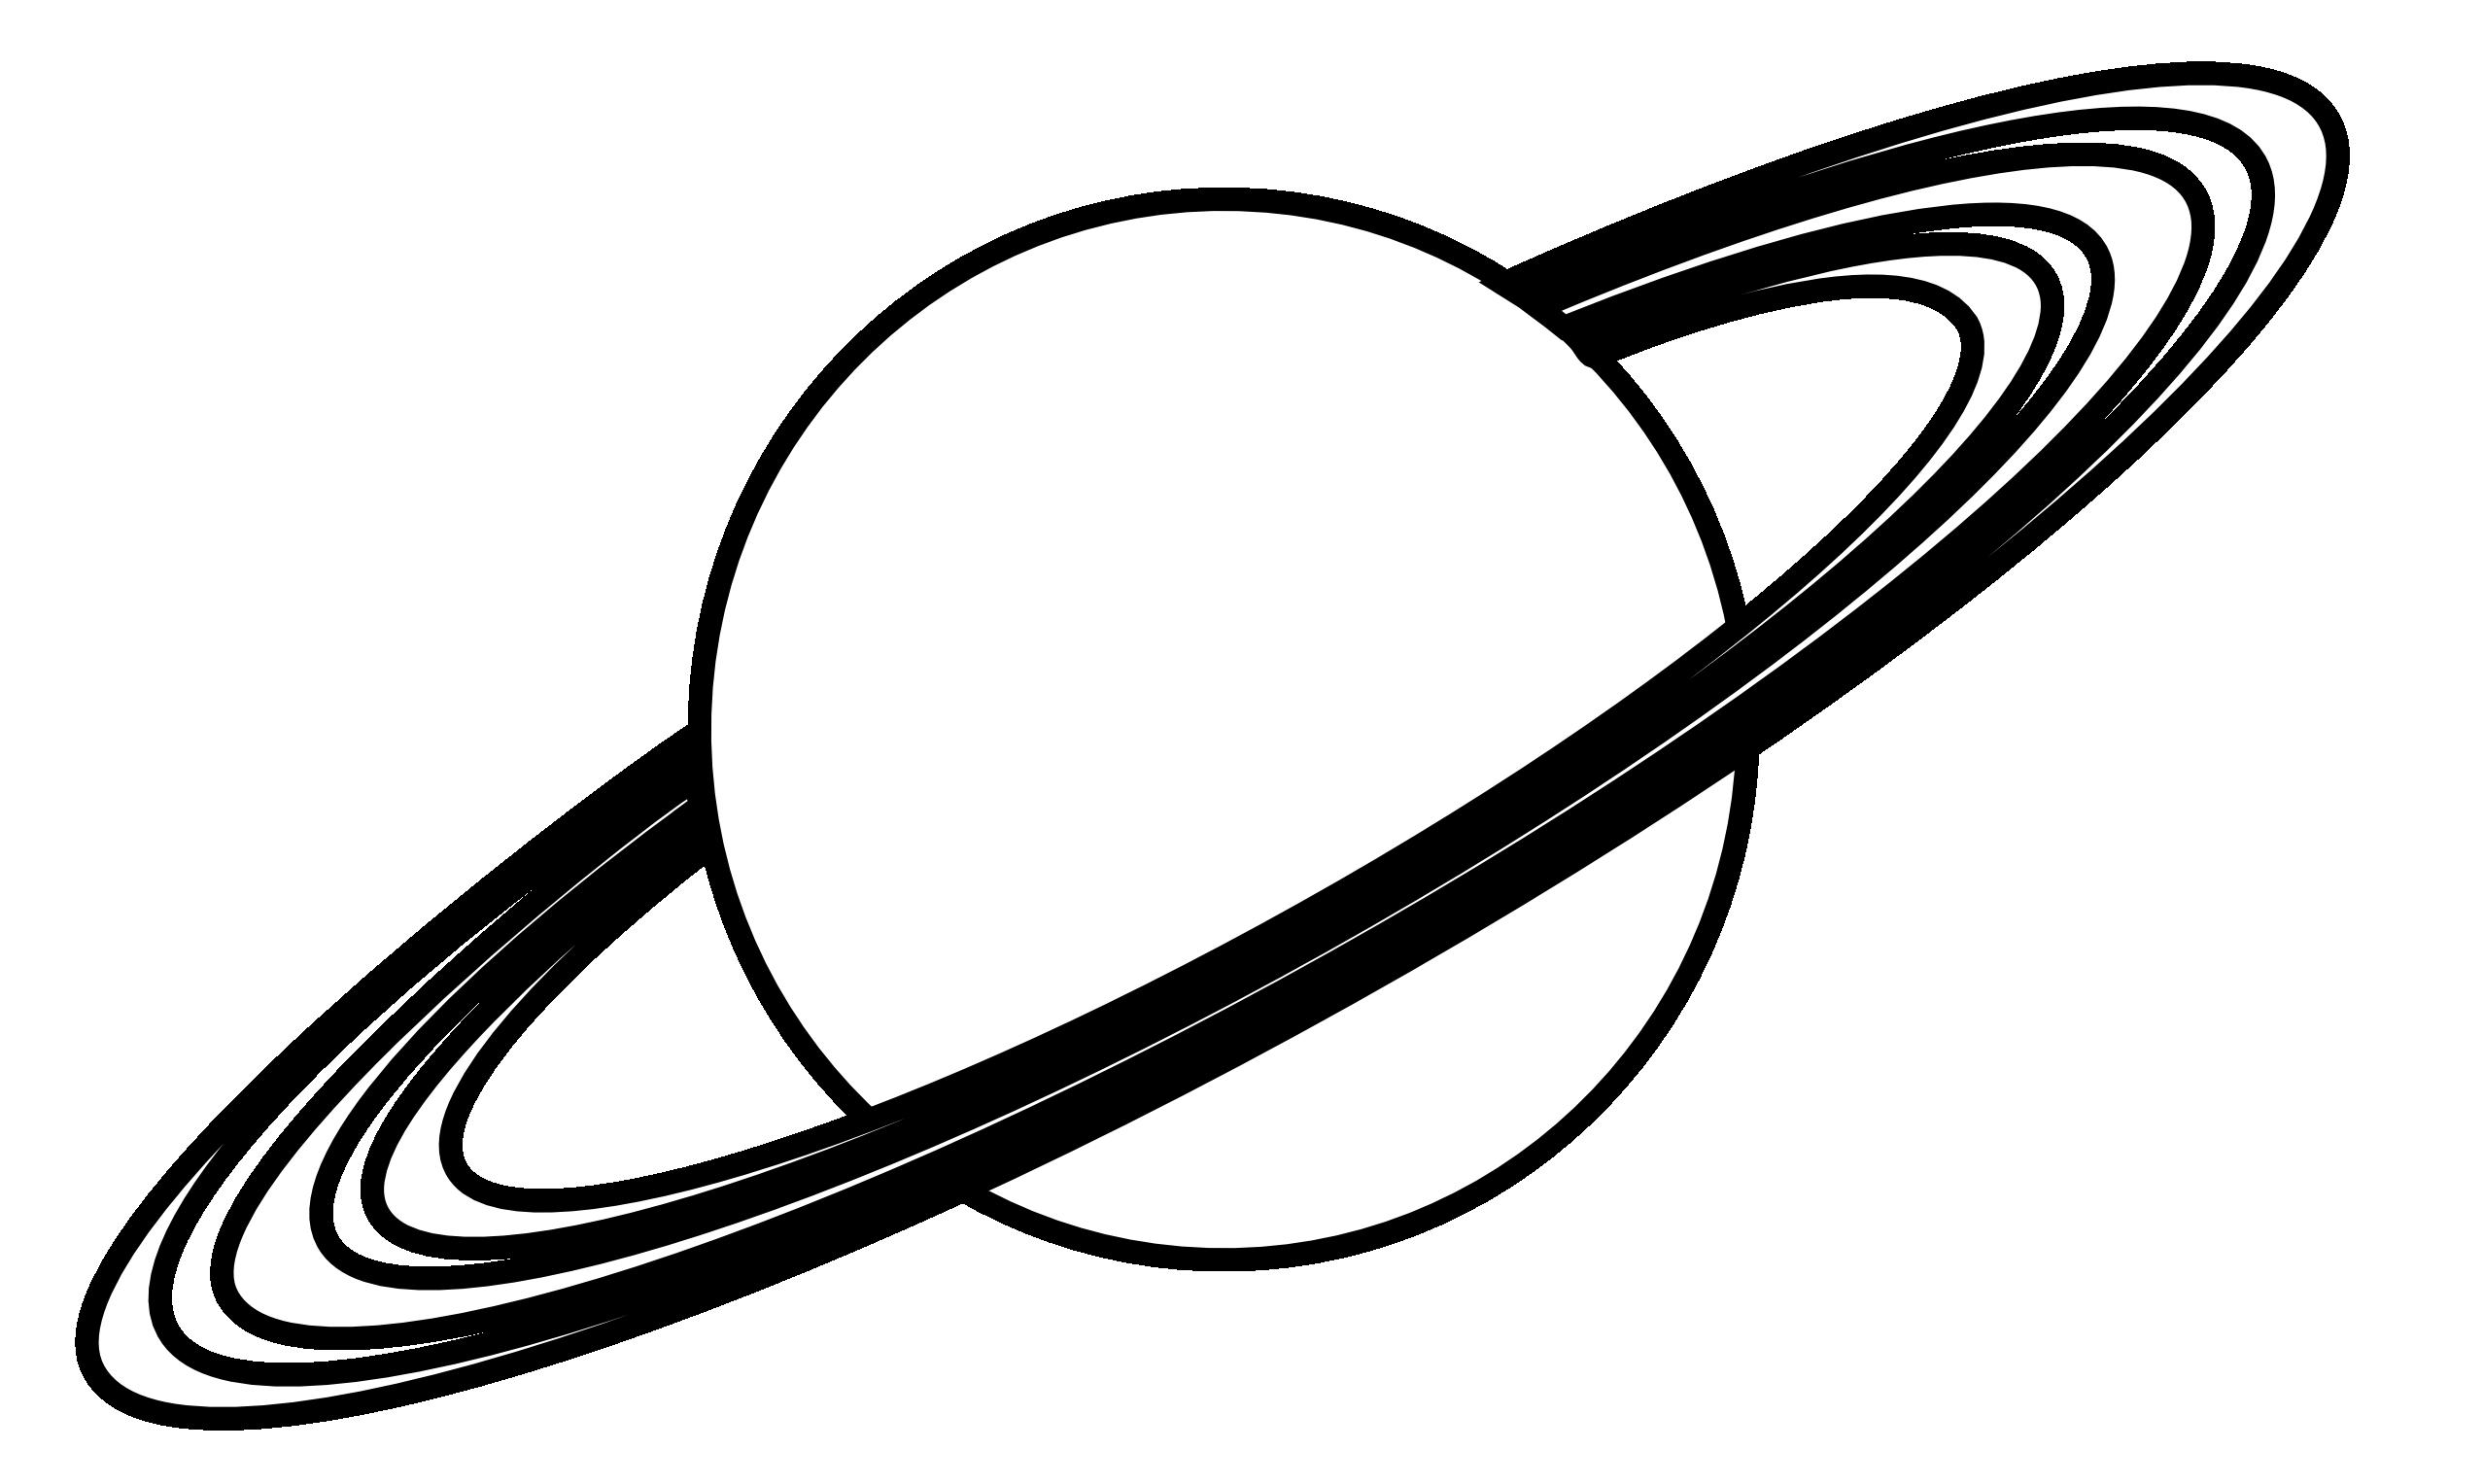 Planet Clip Art Black And White.